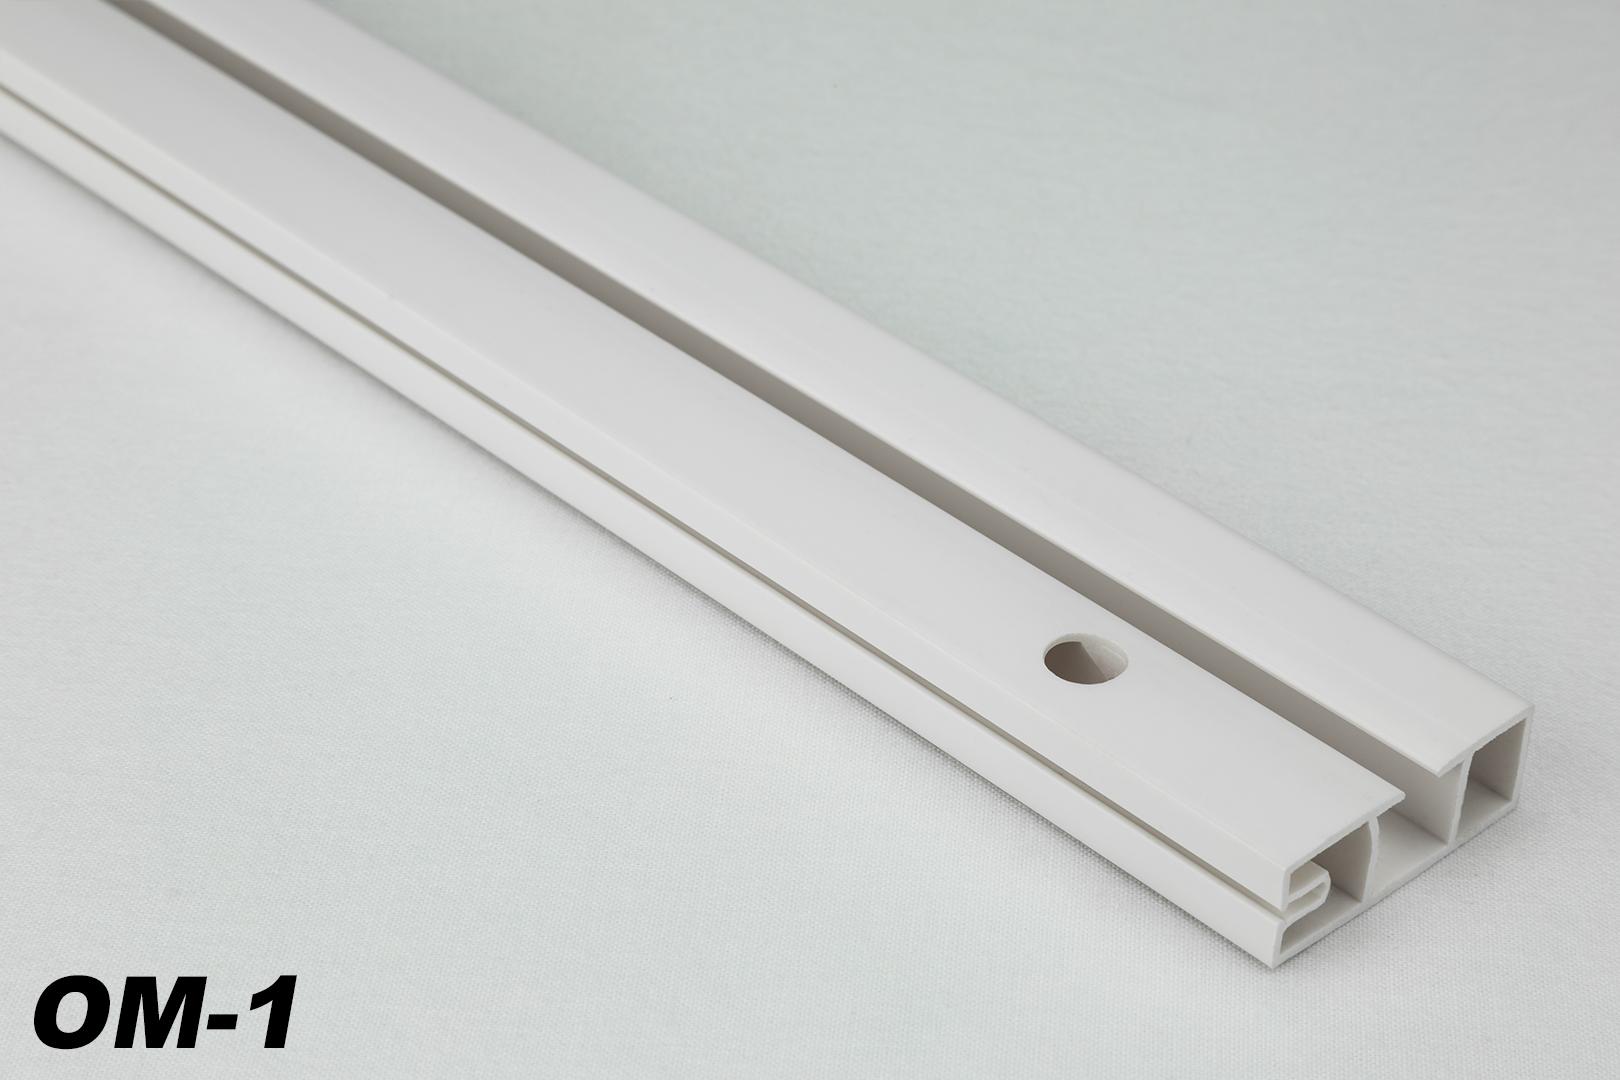 10 meter 1 l ufige pvc gardinenschiene schiebevorhang gardinenbretter om 1 ebay. Black Bedroom Furniture Sets. Home Design Ideas